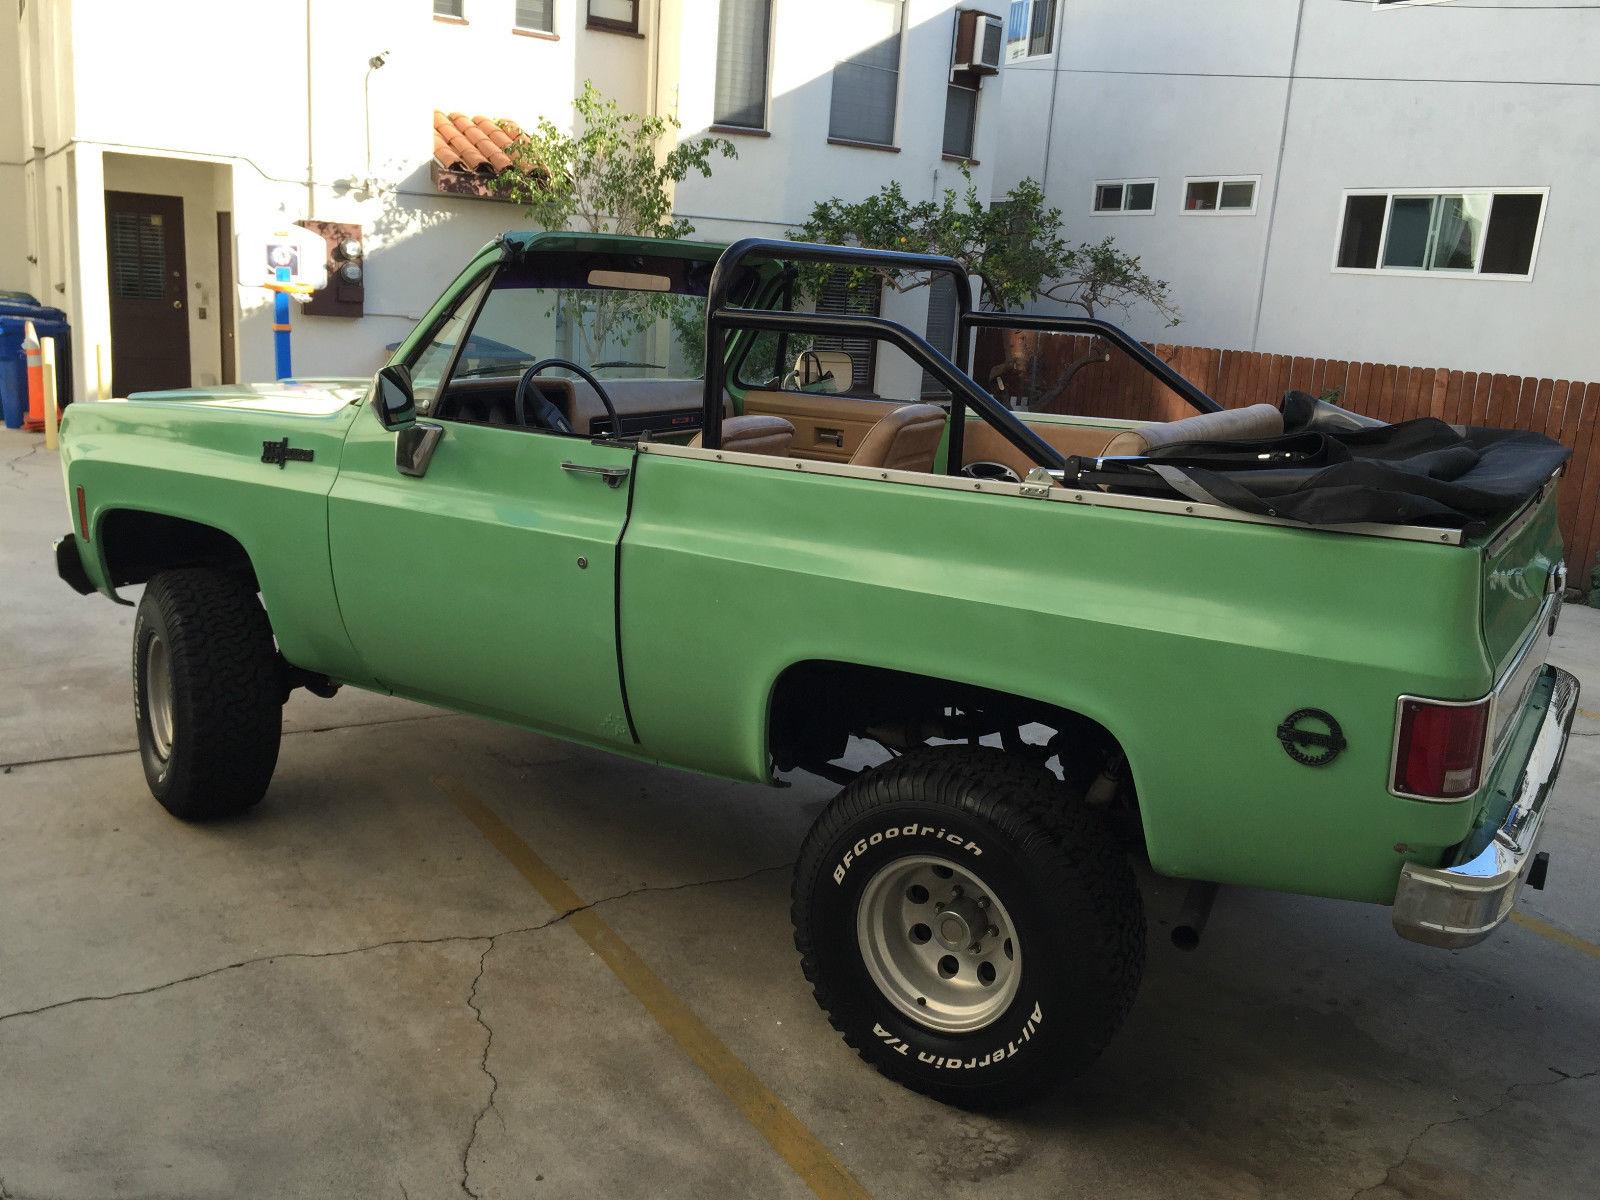 Chevy K5 Blazer For Sale >> ***1973 Chevrolet K5 Blazer 4x4 Convertible SUV - NO ...